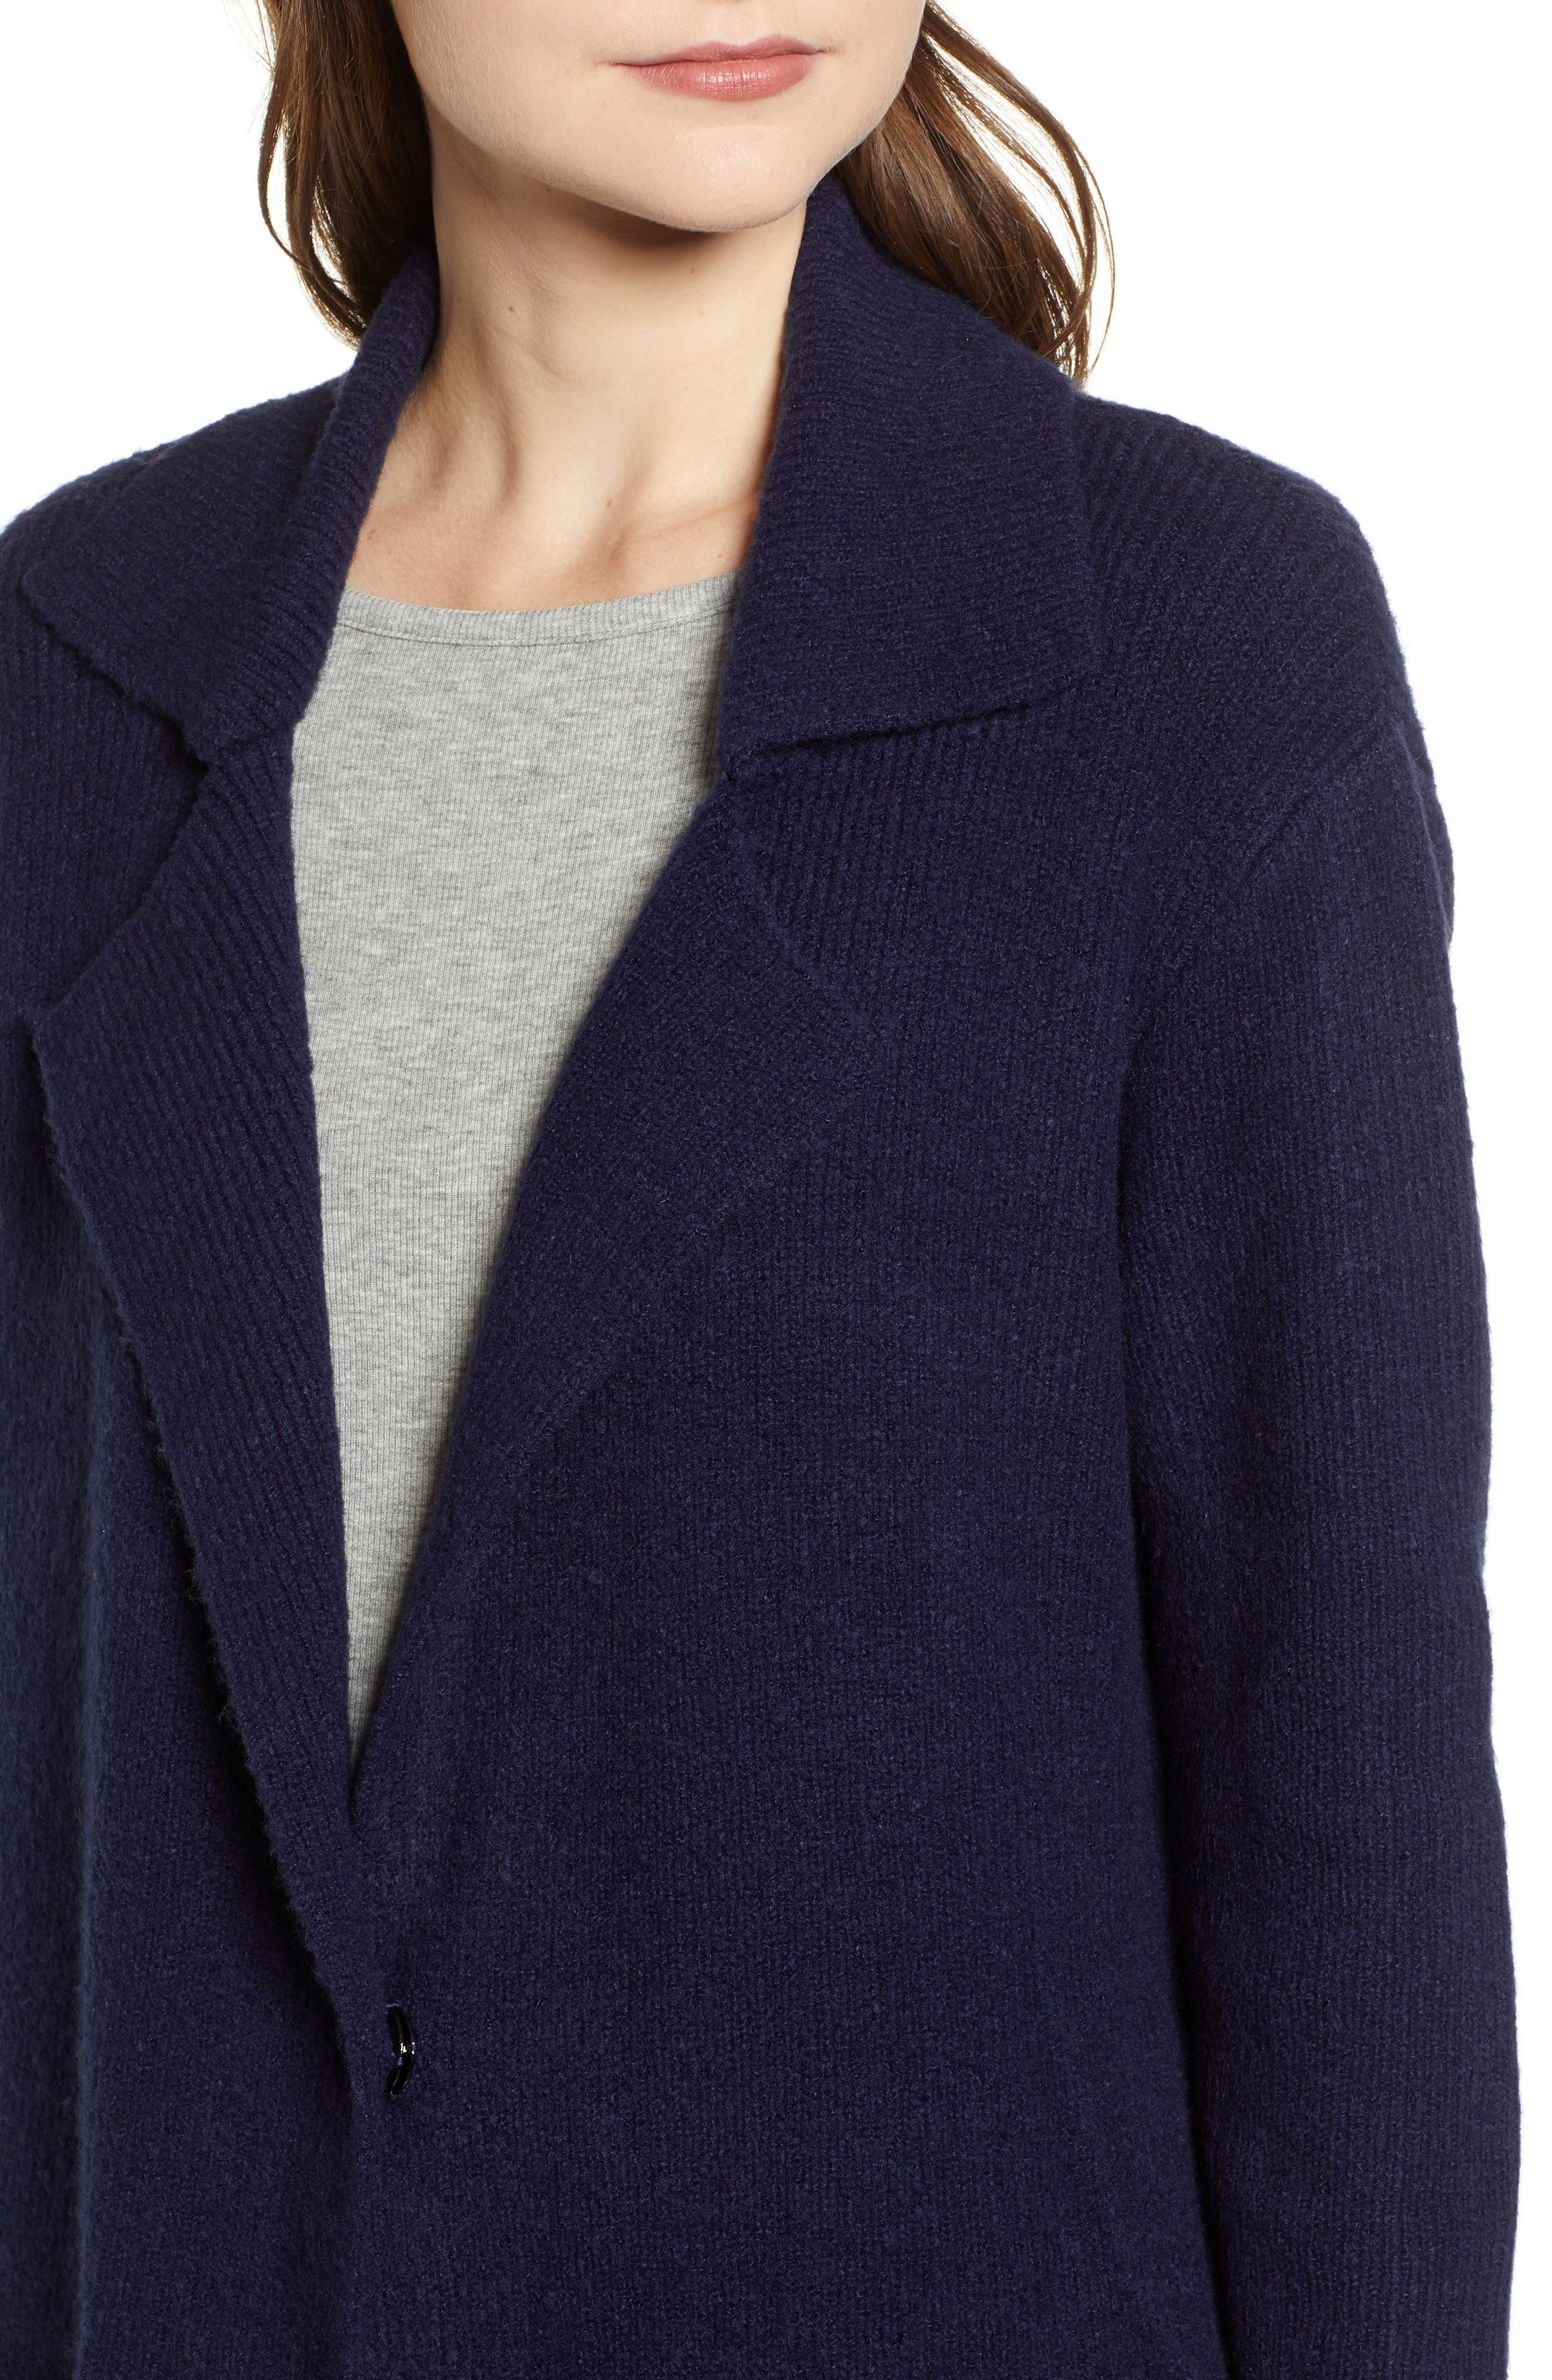 Knit Sweater Coat,                             Alternate thumbnail 4, color,                             NAVY MARITIME